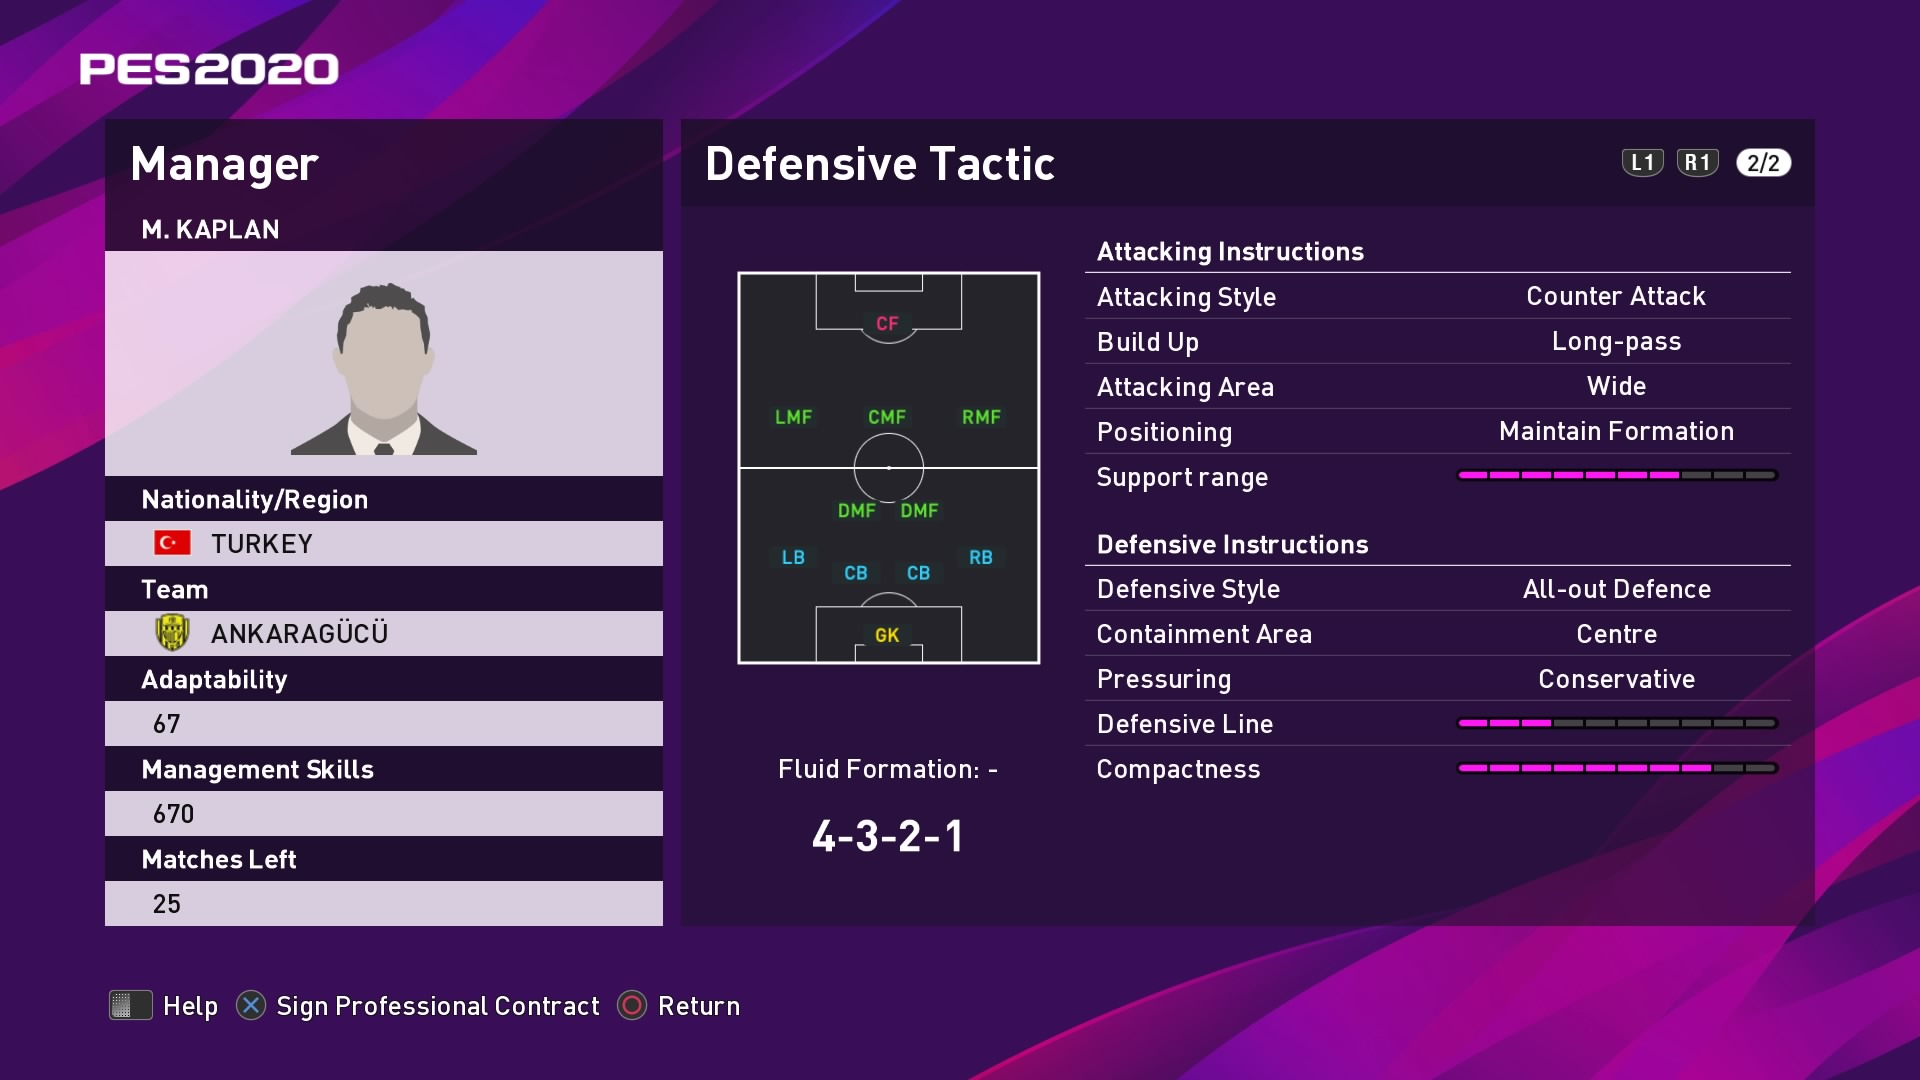 M. Kaplan (Mustafa Kaplan) Defensive Tactic in PES 2020 myClub